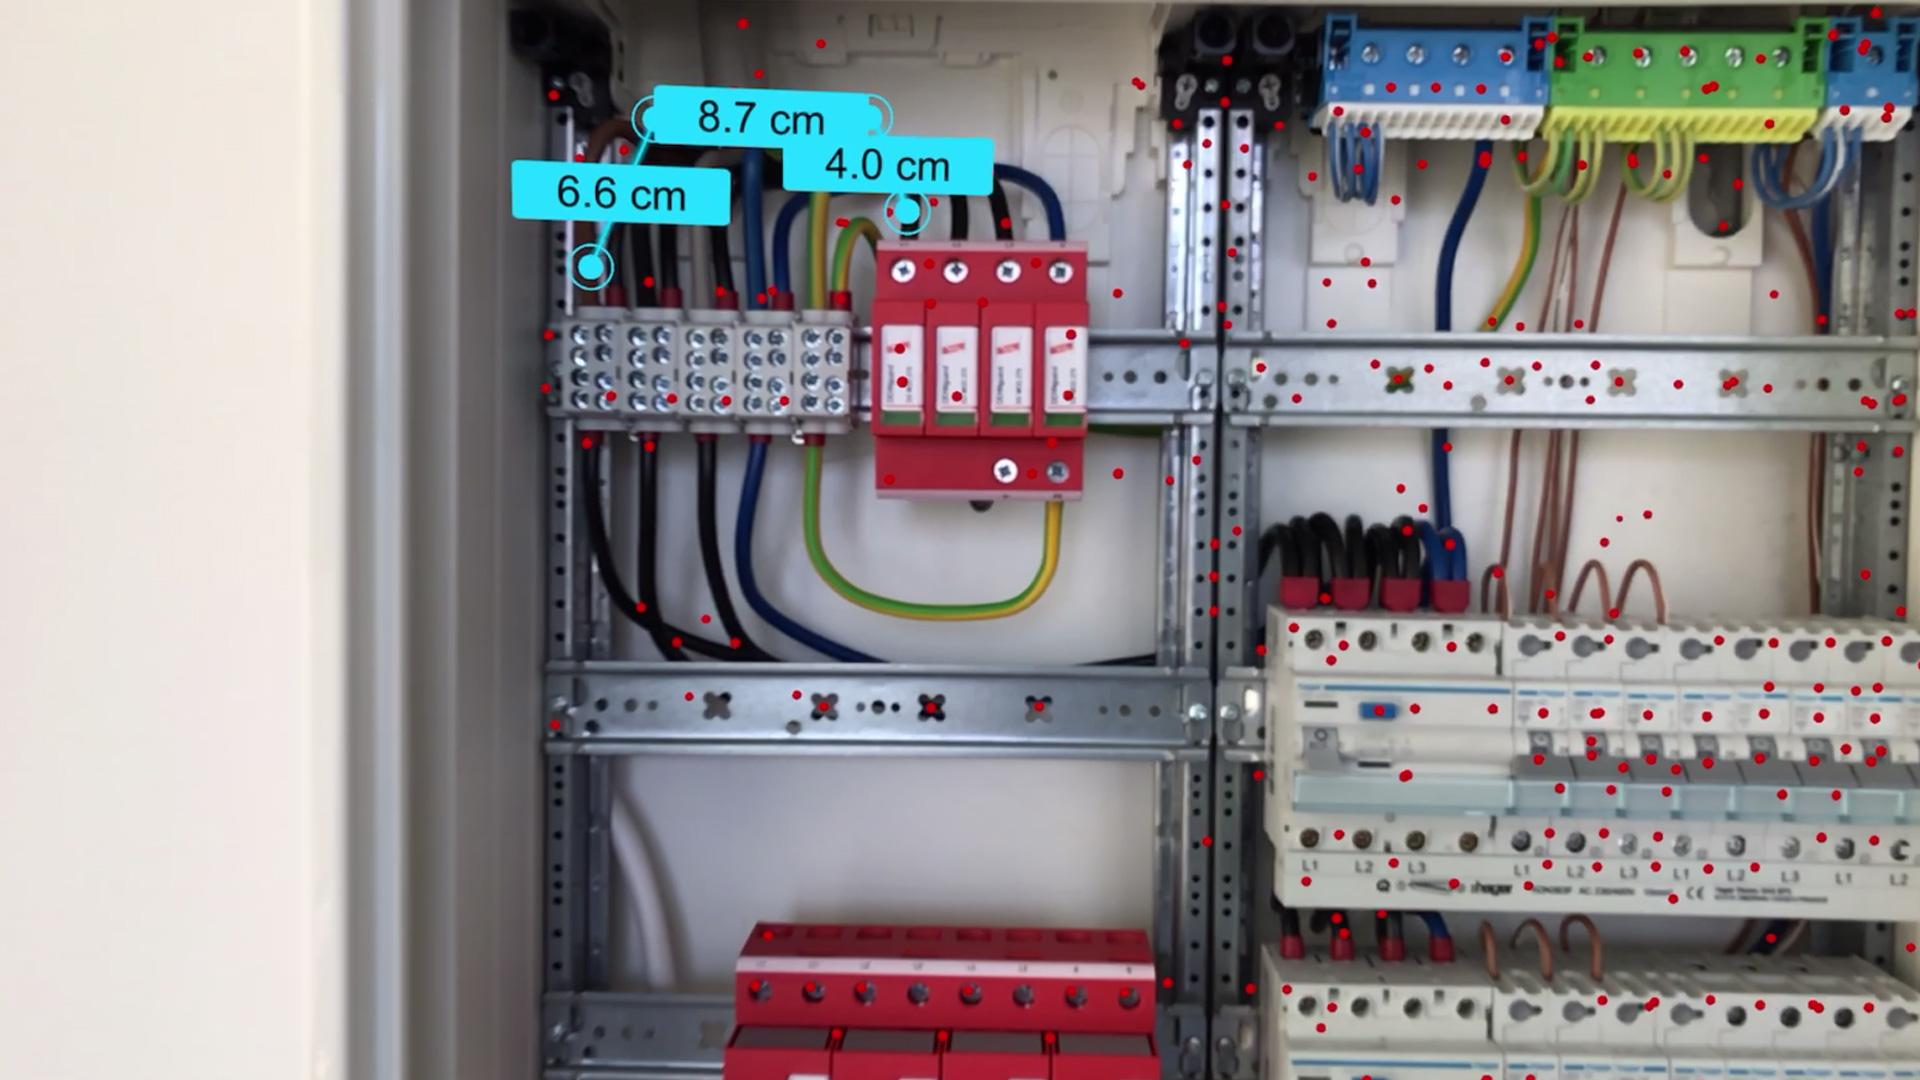 switchgear-assistent-triboot-technologies-02a